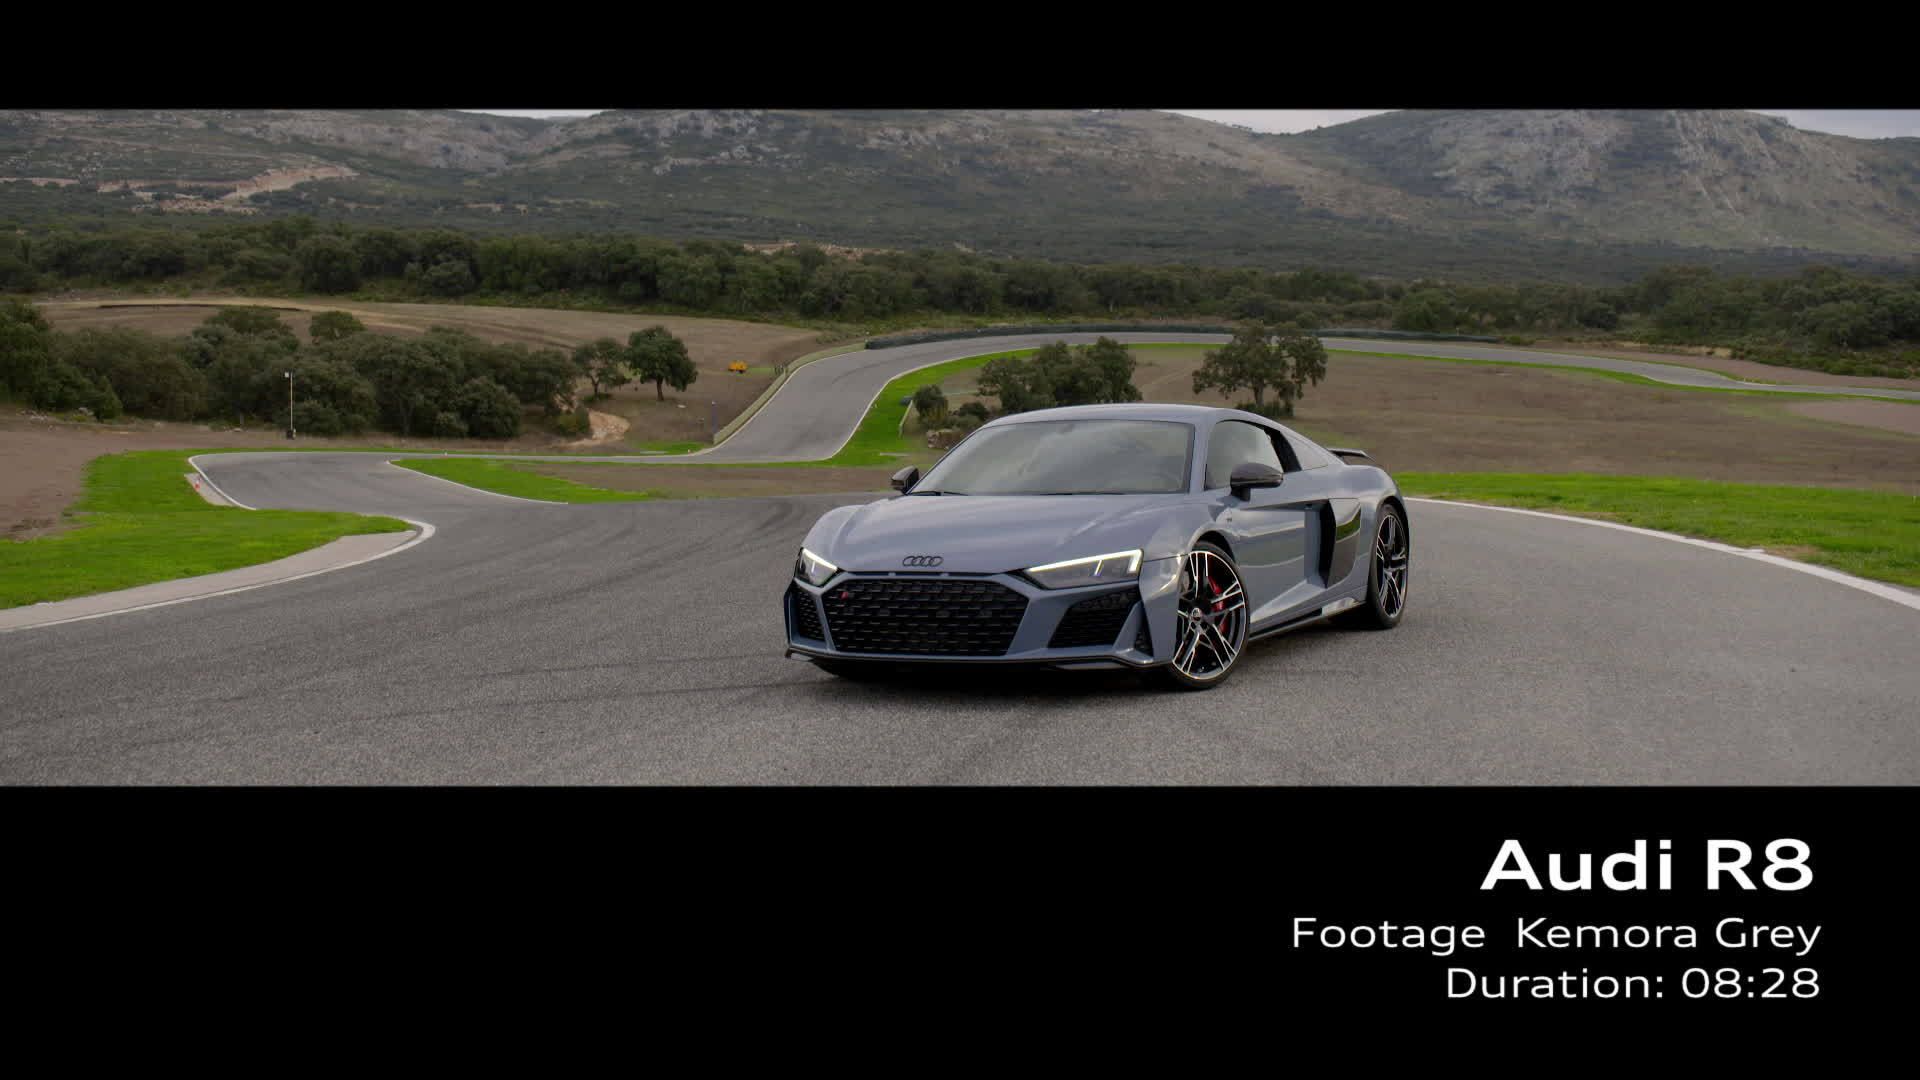 Audi R8 Footage Kemora Grey